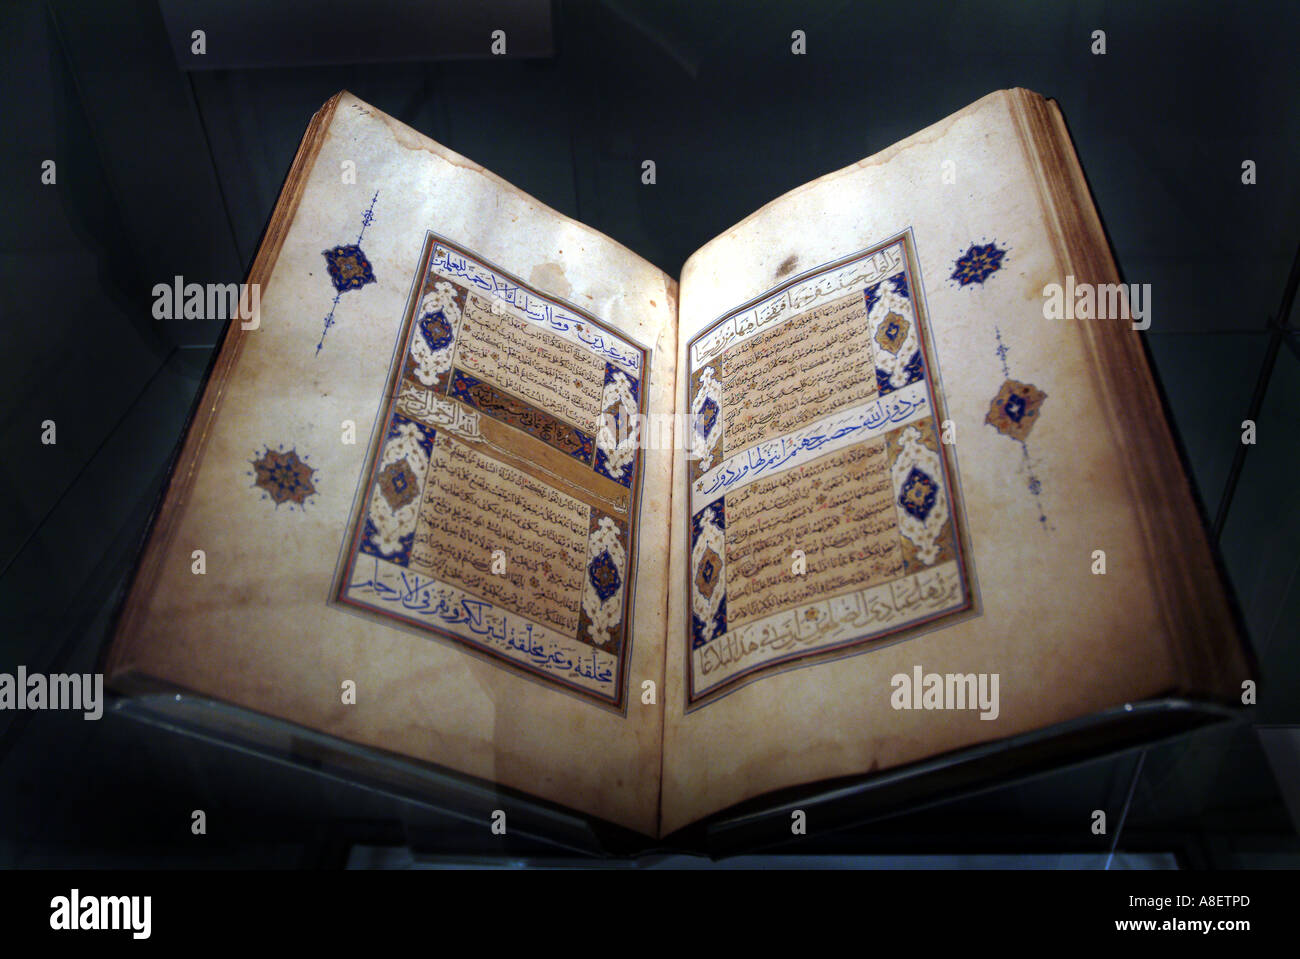 16th CENTURY ISLAM S SACRED BOOK QURAN BRITISH MUSEUM LONDON - Stock Image